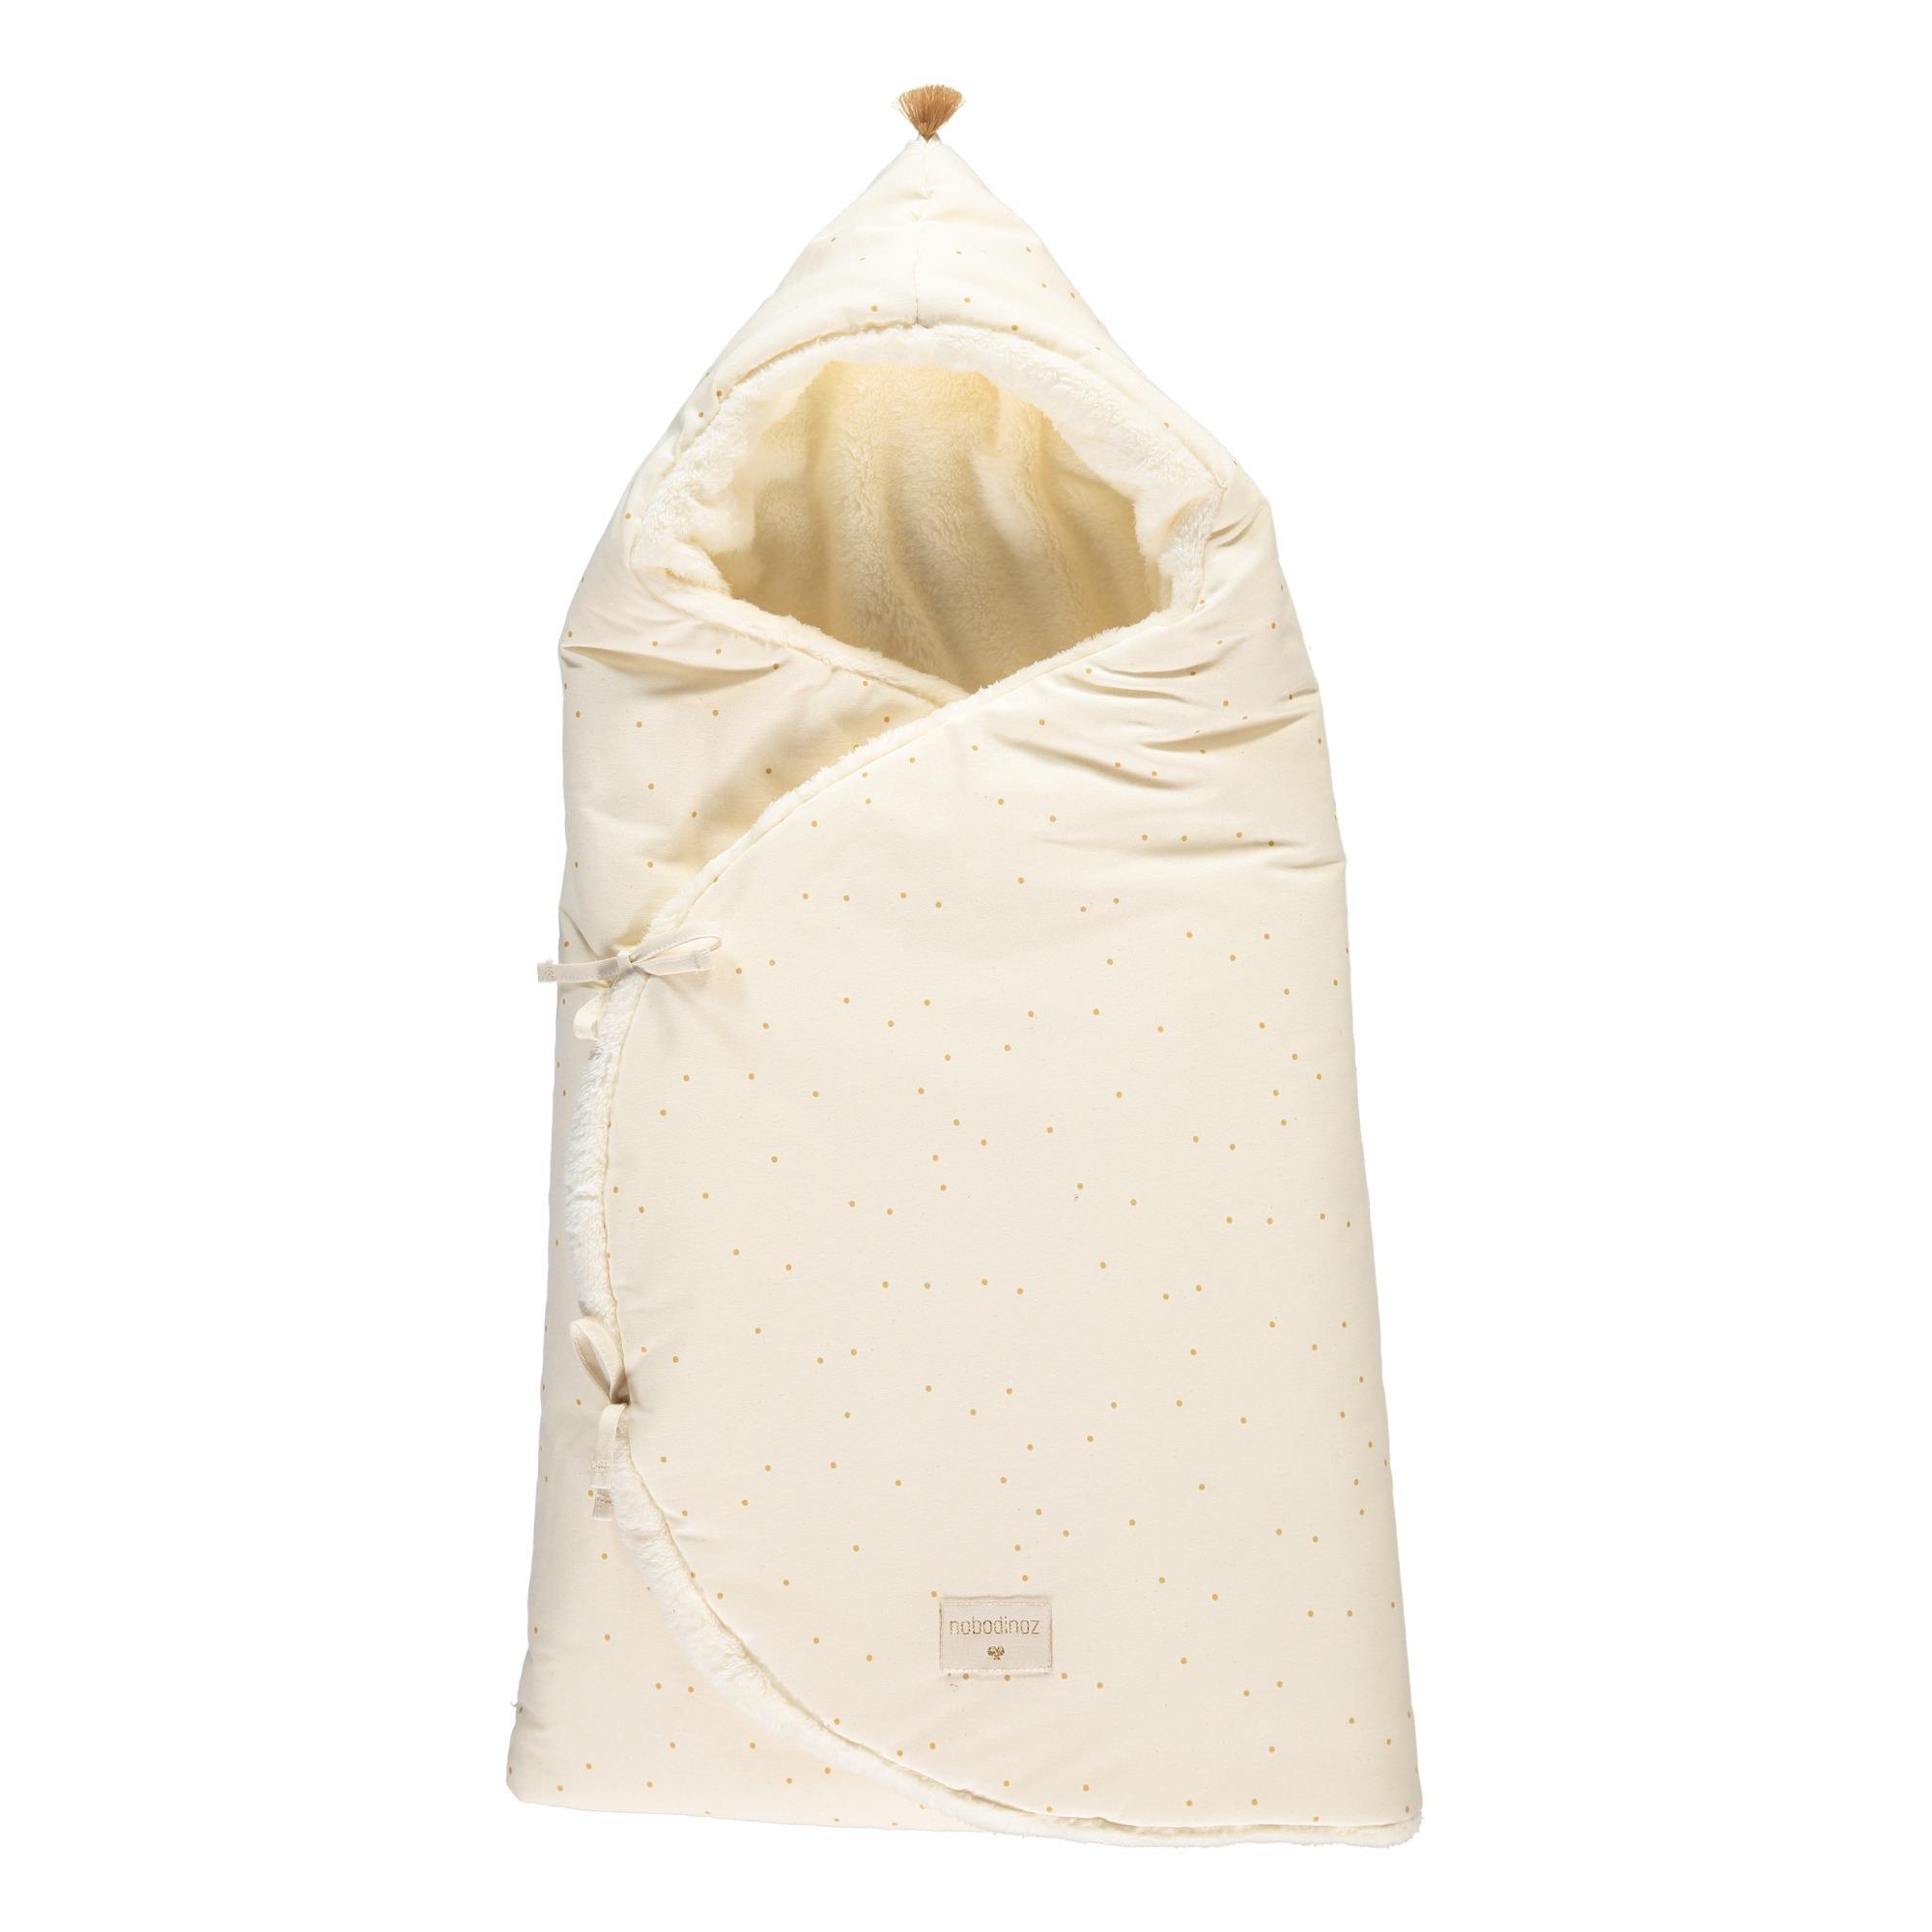 7938eee92f6 Cozy - Organic cotton baby wrap with polar fleece lining. «